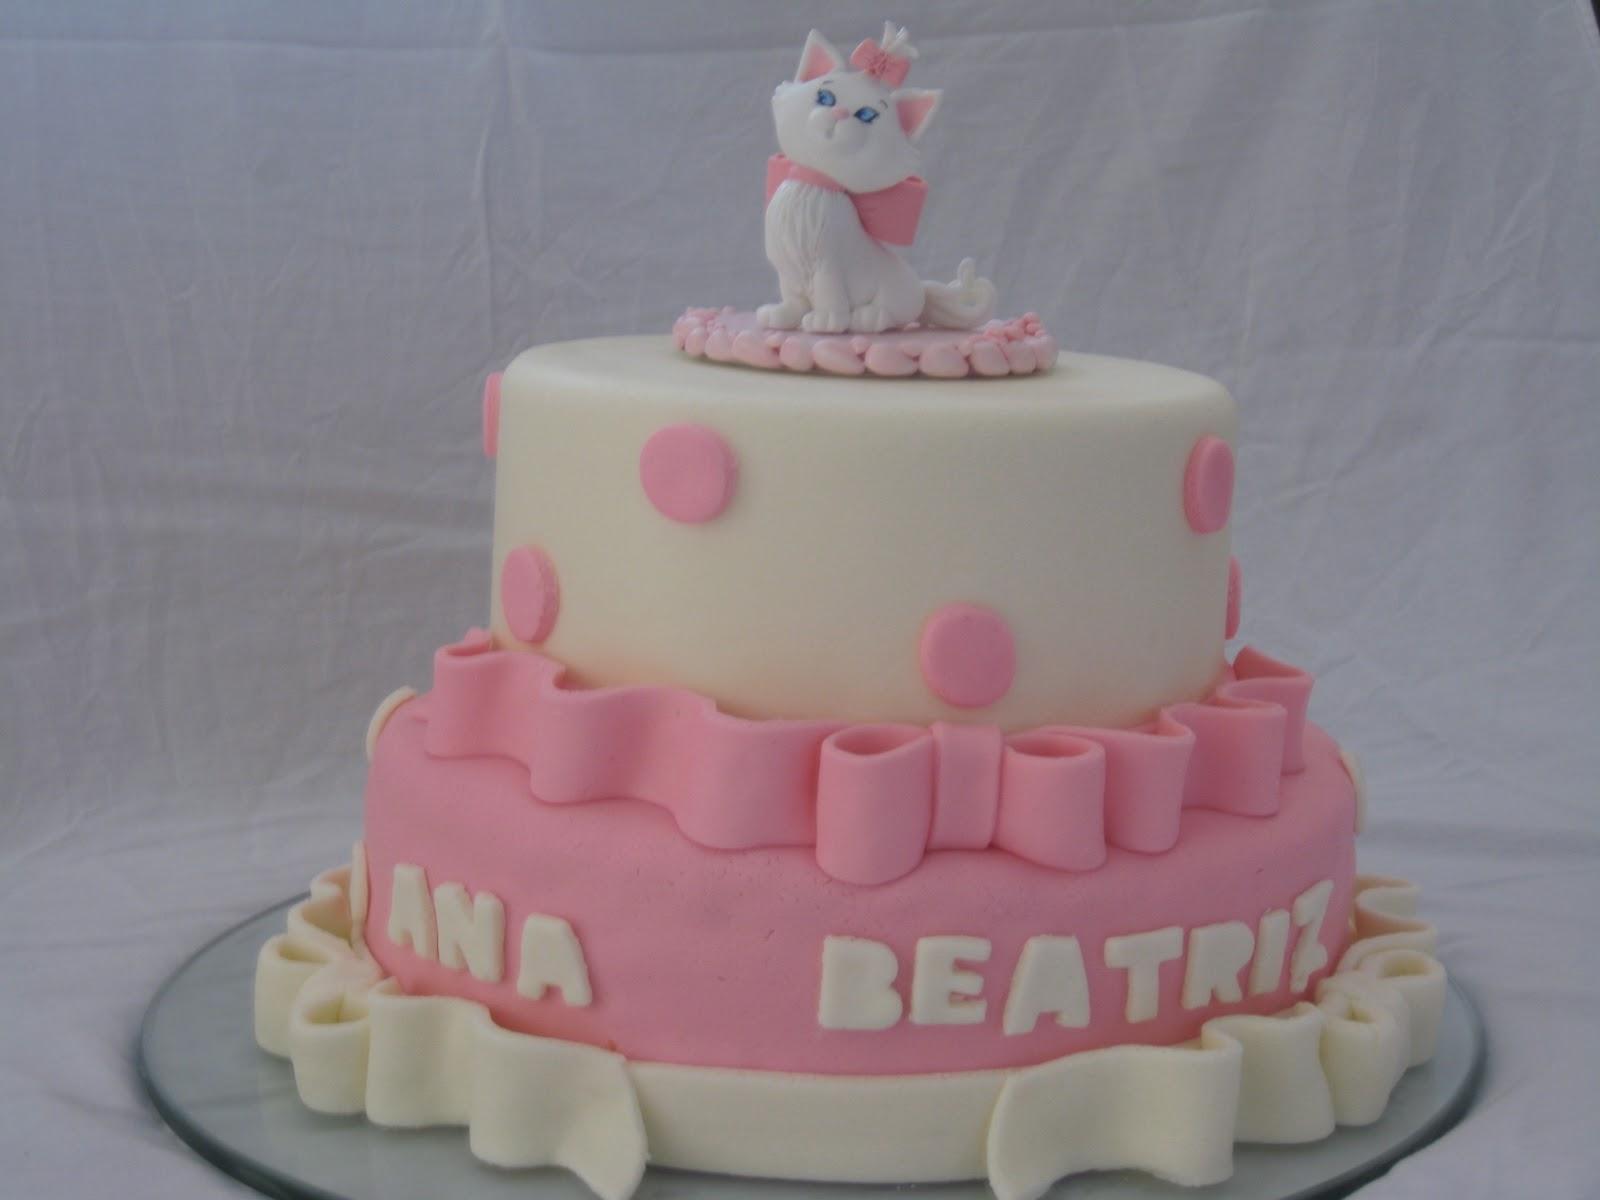 comment on this picture caroline lanzoni cake designer gatinha marie